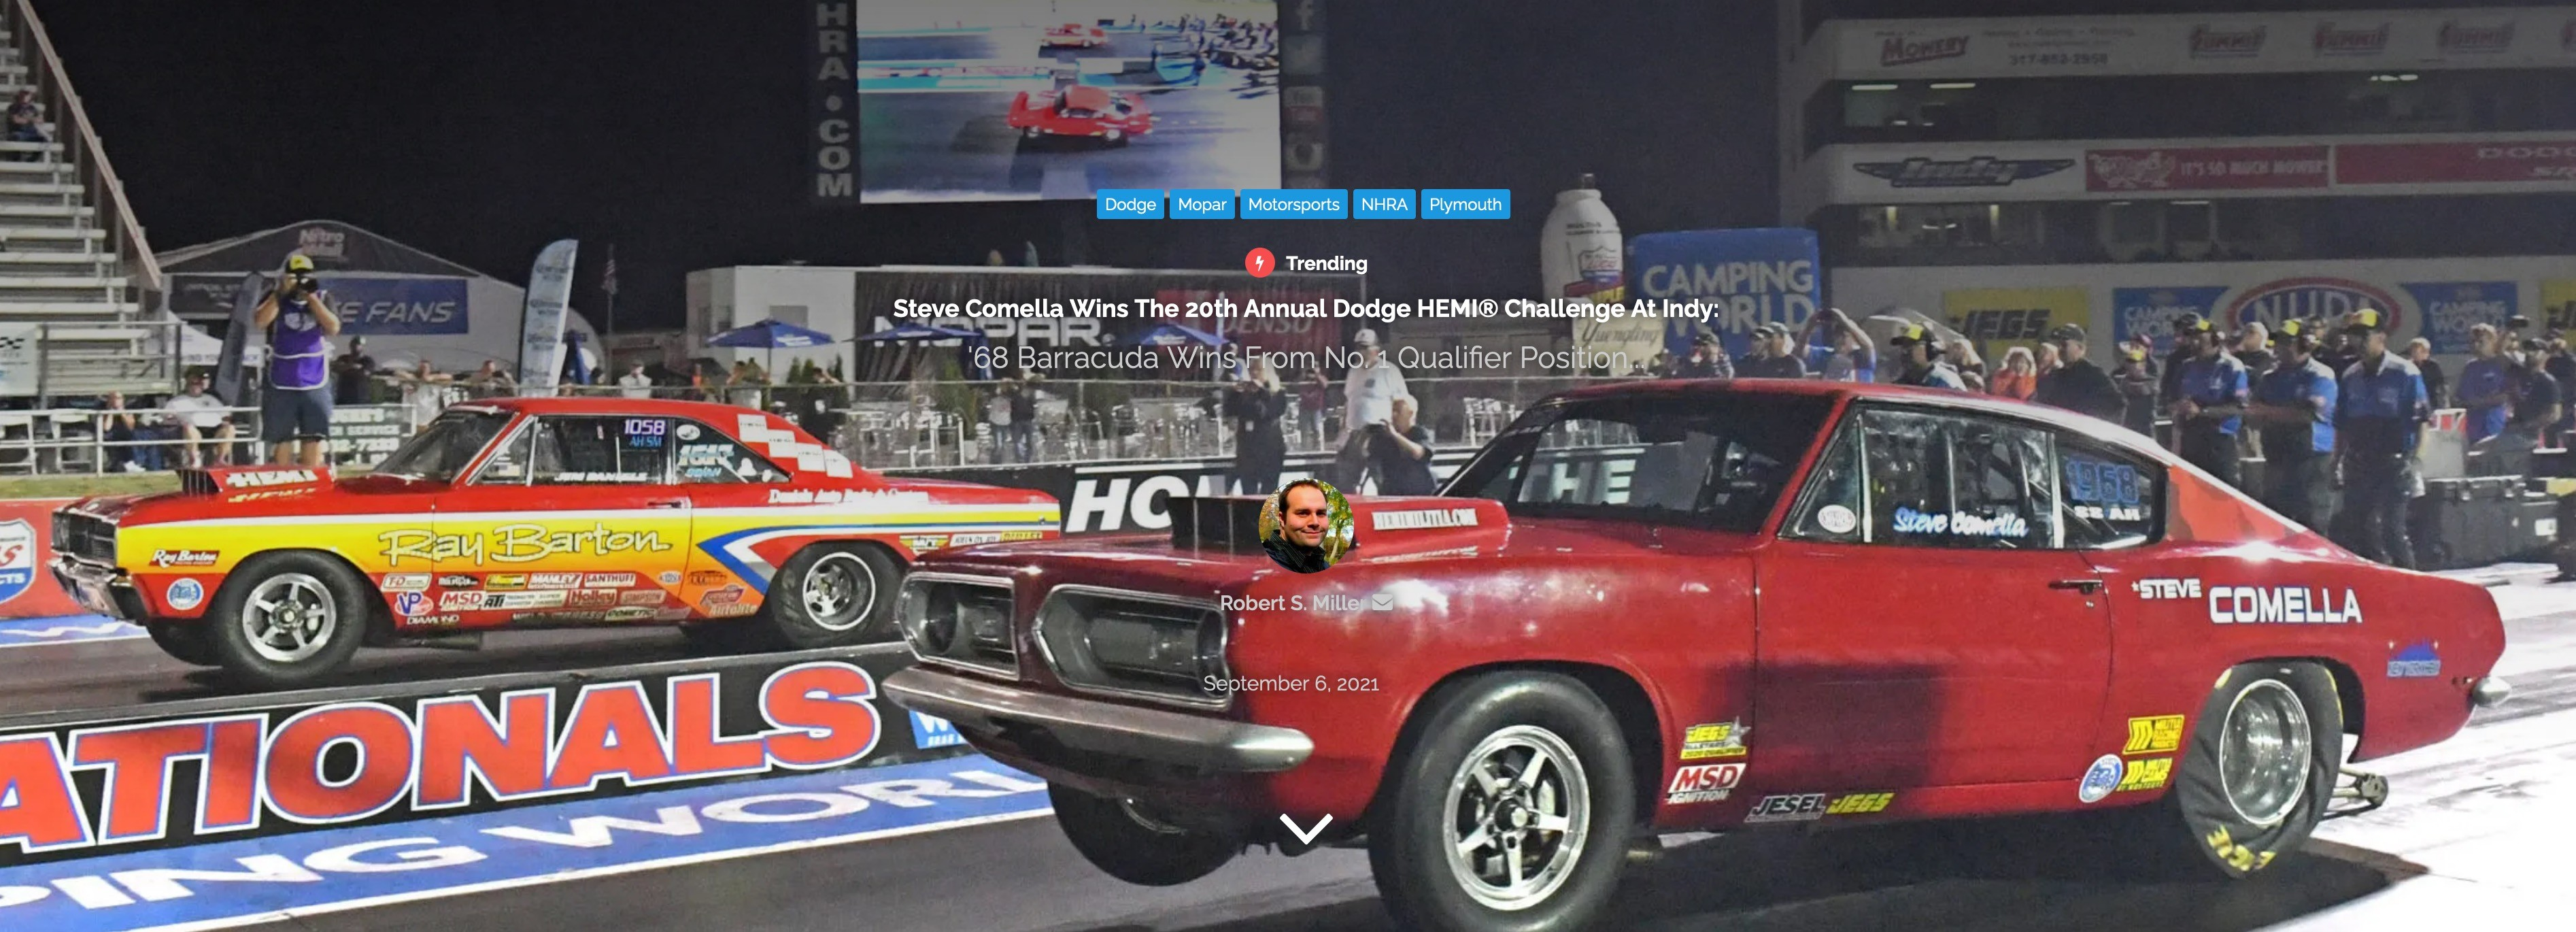 68 Barracuda Wins Dodge HEMI Challenge